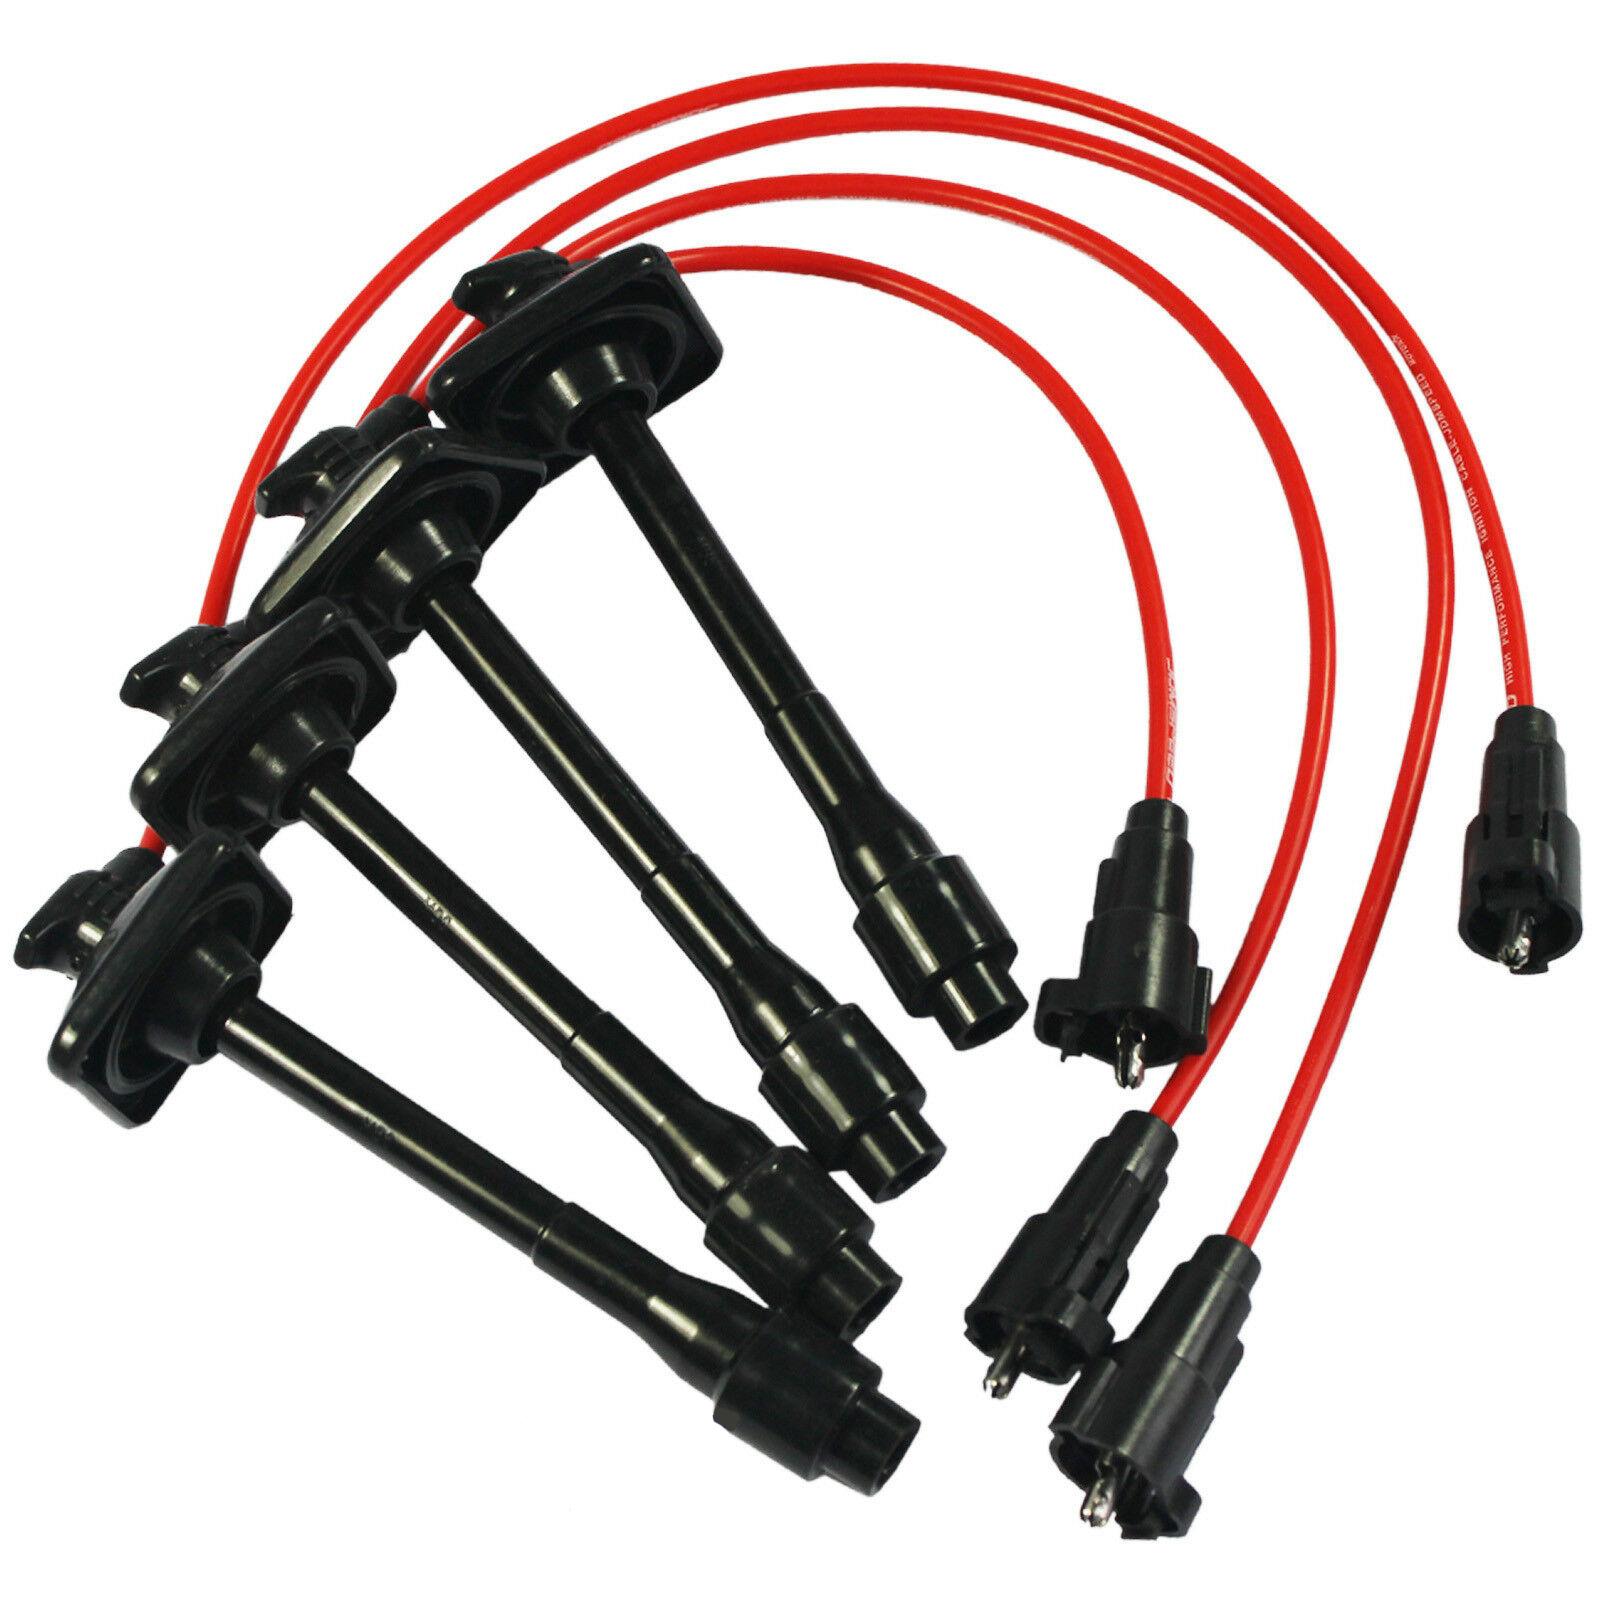 Ignition Spark Plug Wires  90919-22400 for 97-01 Toyota Camry Solara Rav4 2.2L